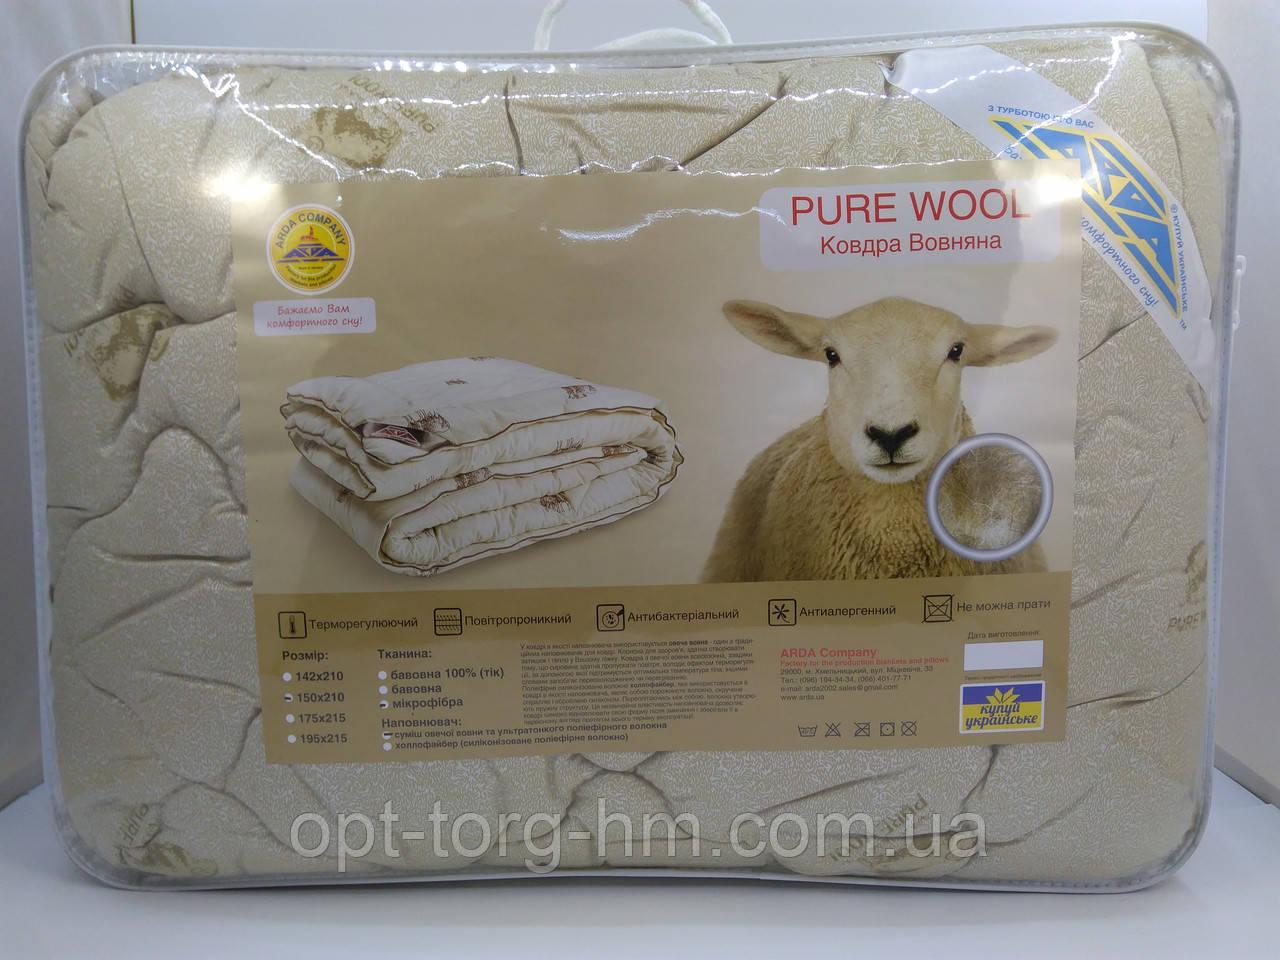 Одеяло Шерстяное Pure Wool 175*215 ARDA Company